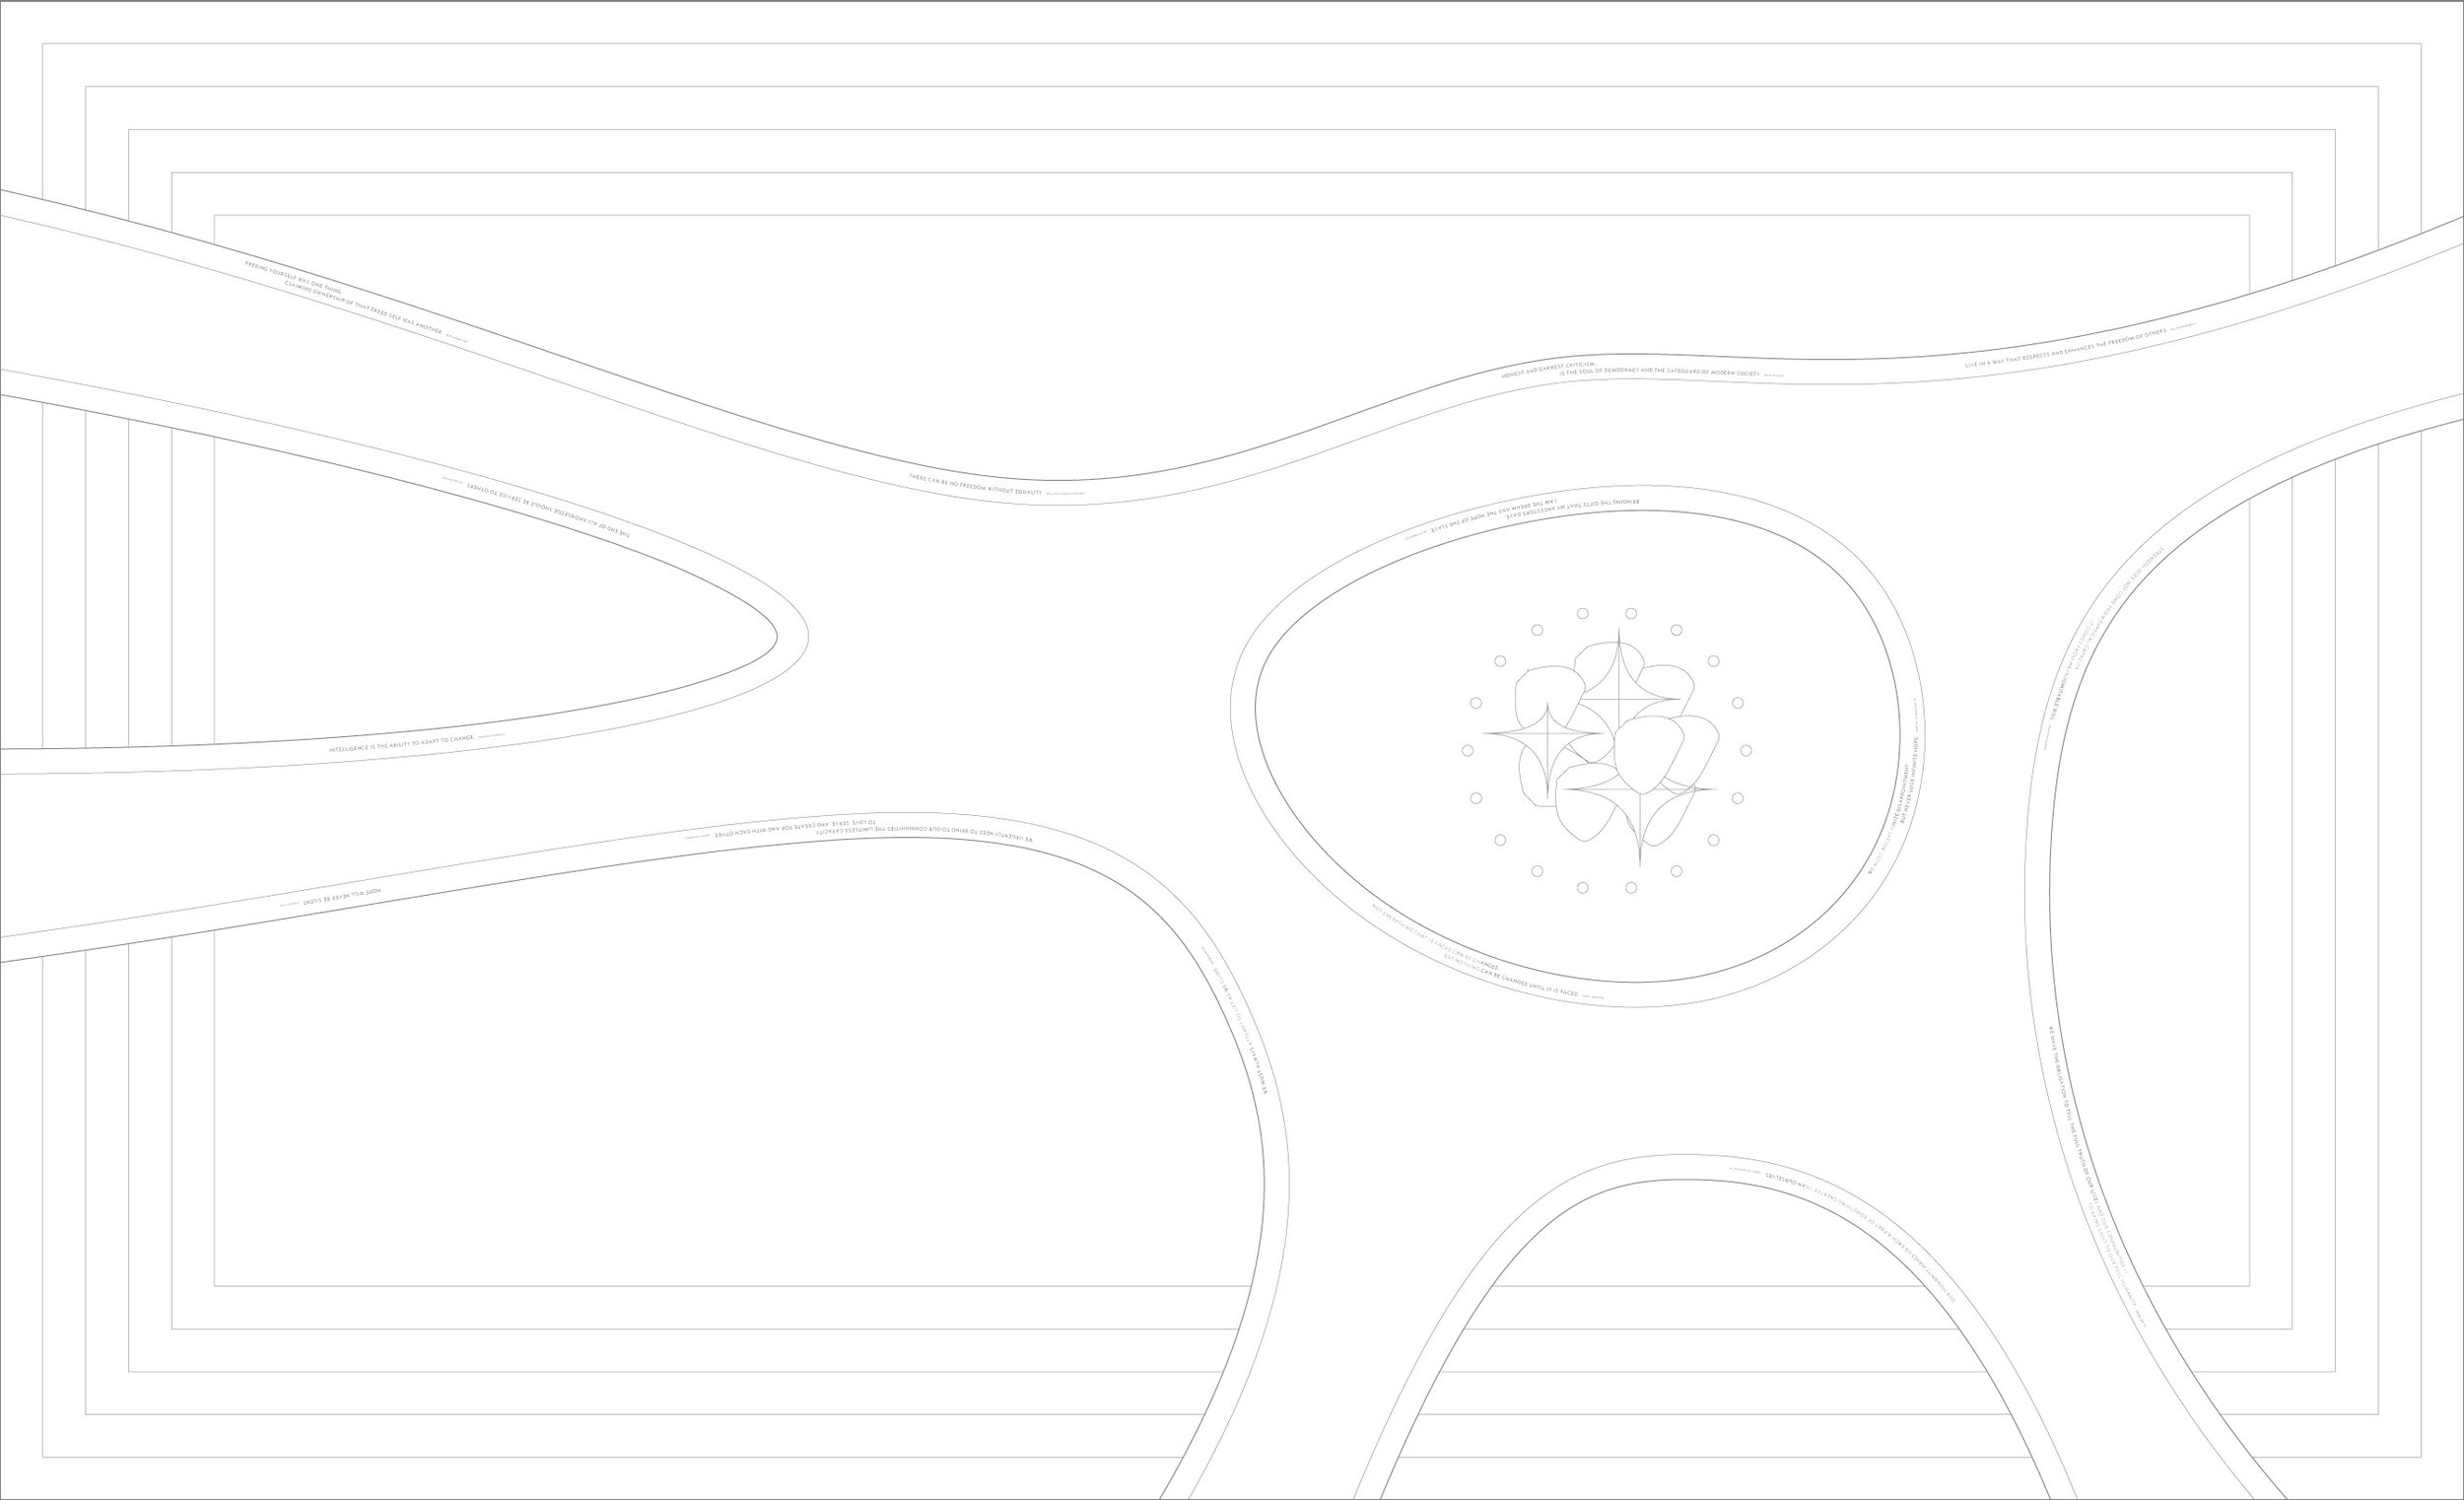 boe_2690_plan_typography_design.jpg